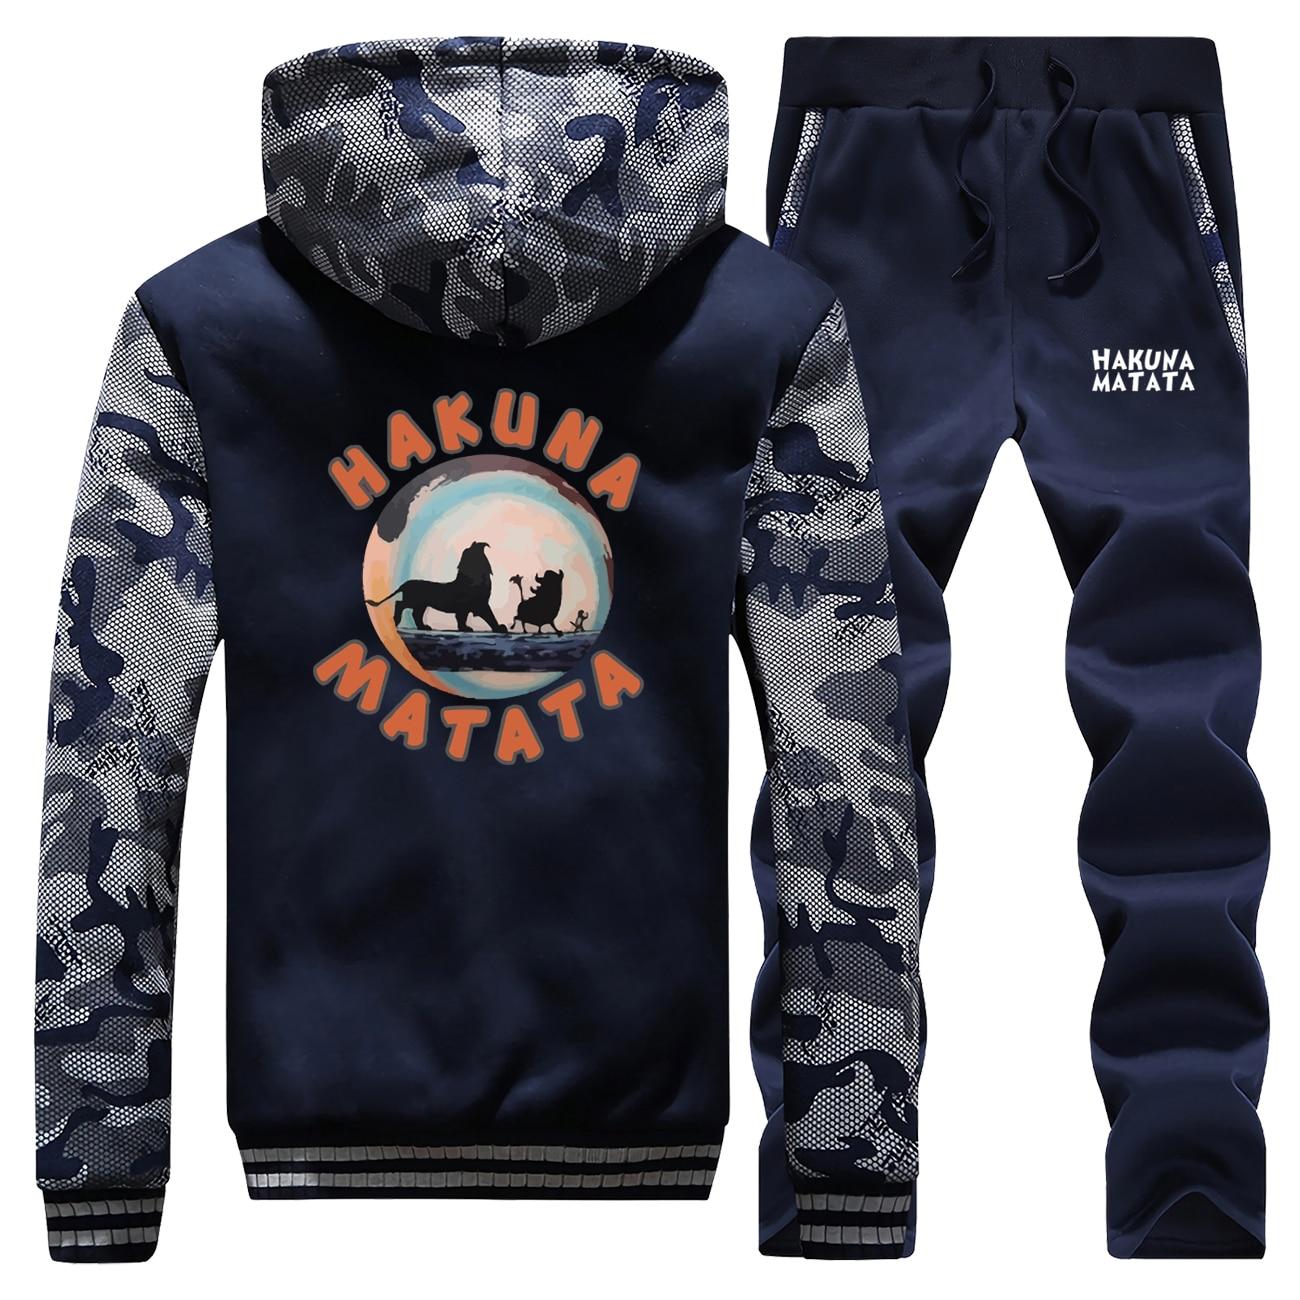 The Lion King Tracksuits Jacket Pant Set Men Hakuna Matata Simba Pumbaa Timon Hoodies Sweatpant Sets Suit 2 PCS Coat Sportswear